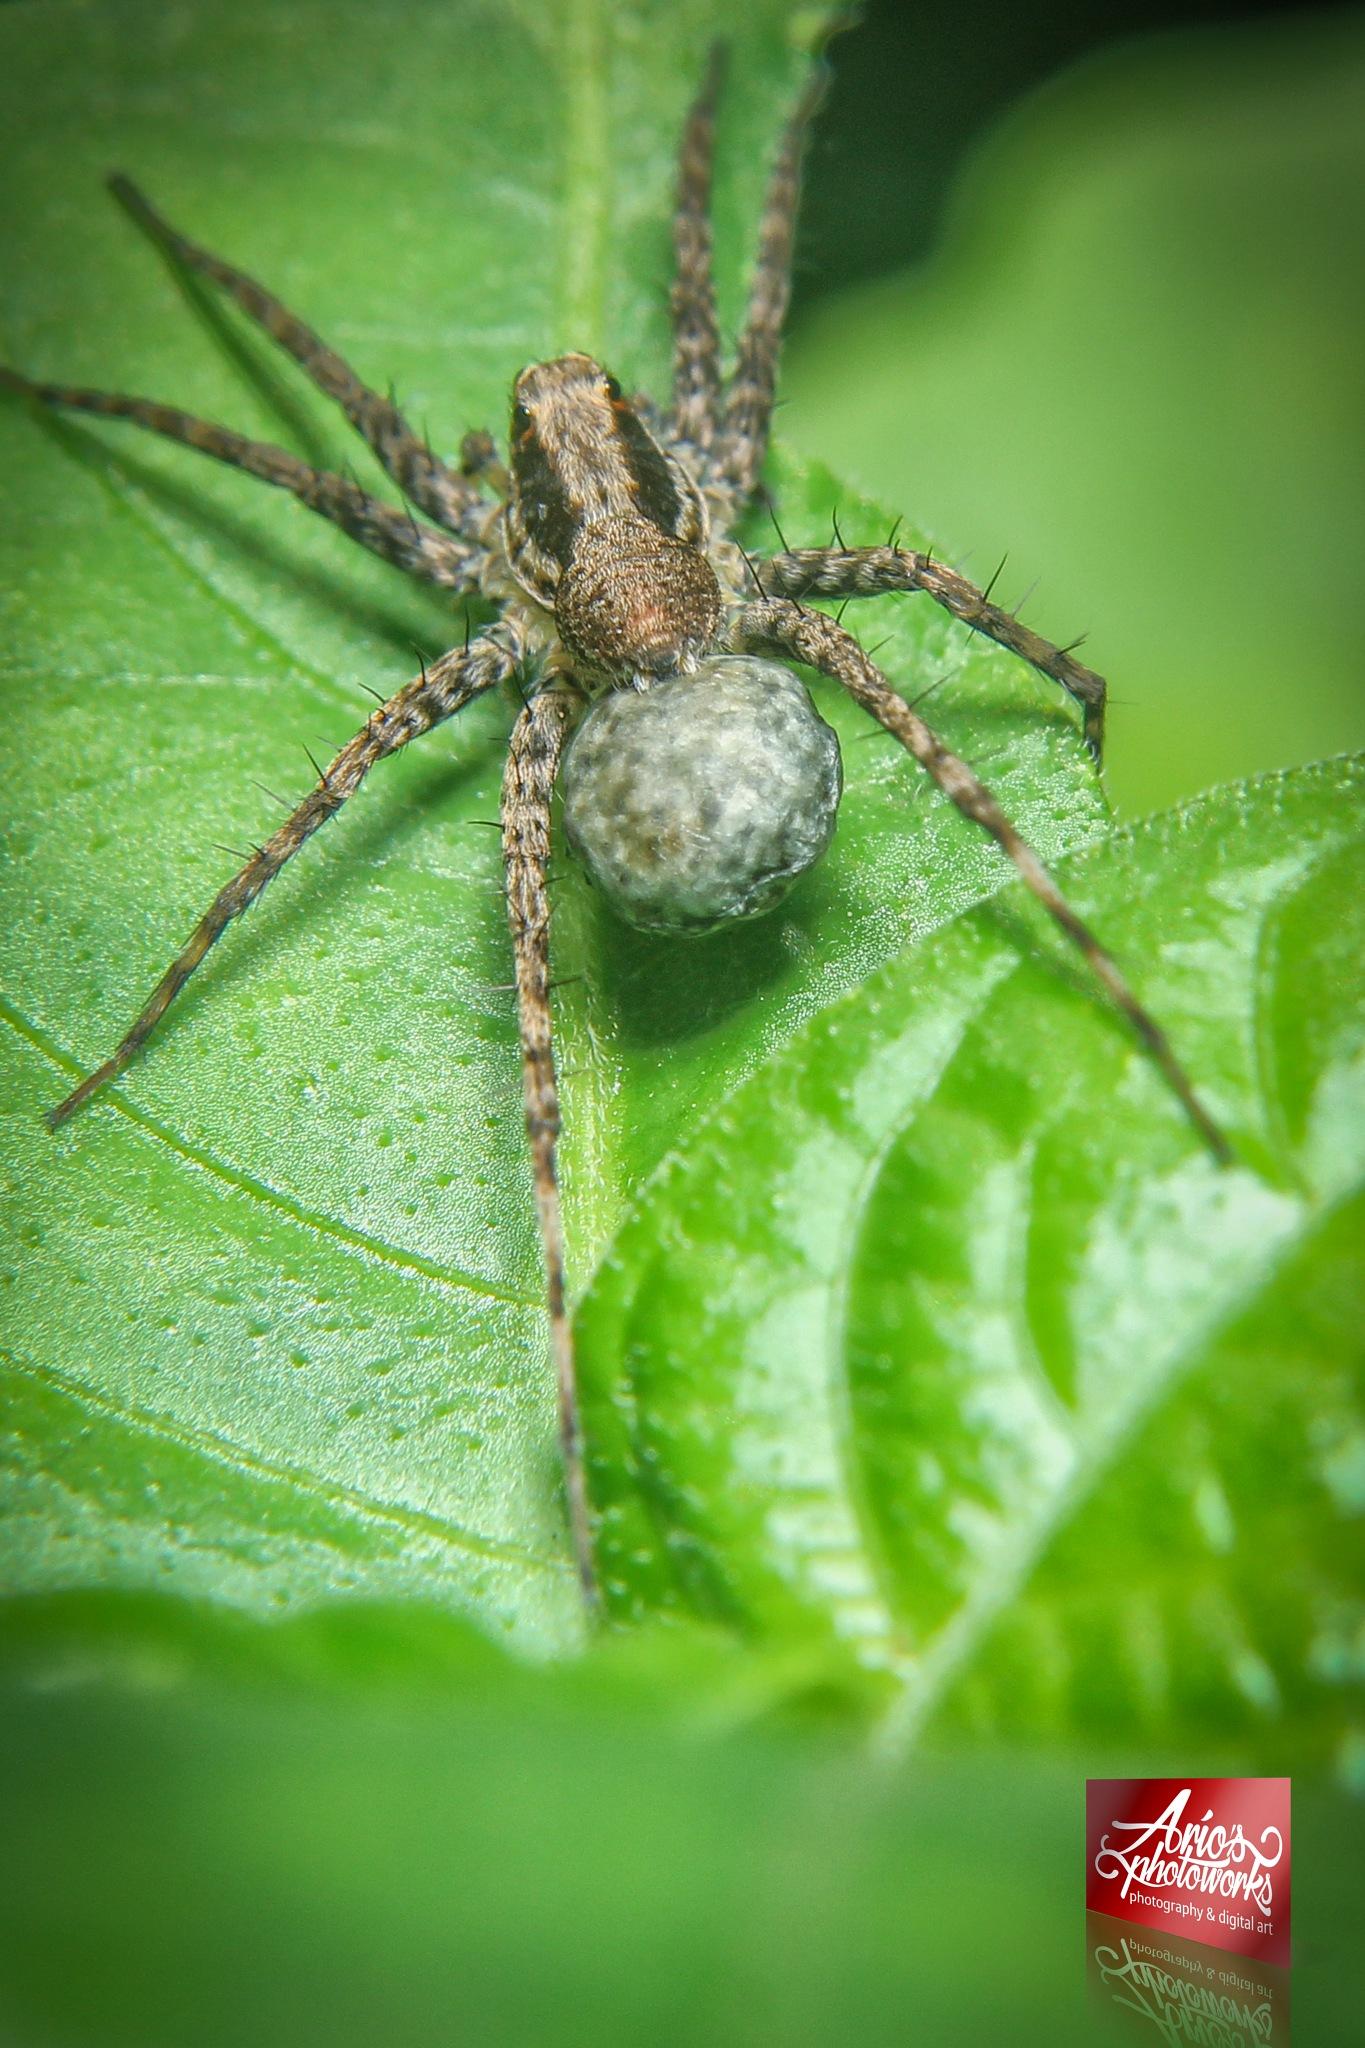 spiderbalon by ario photowork